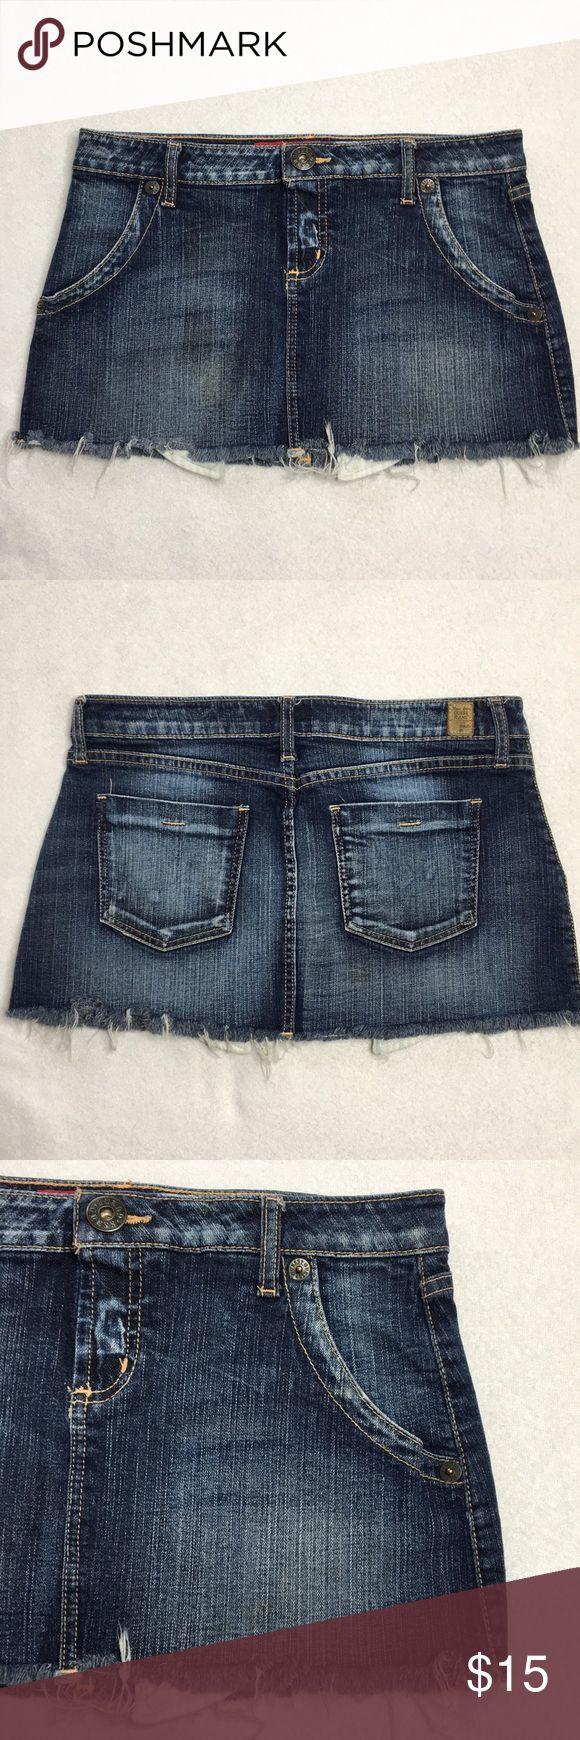 I just added this listing on Poshmark: Guess Jean Mini Skirt w/ Frayed Hems - Sz 29. #shopmycloset #poshmark #fashion #shopping #style #forsale #Guess #Dresses & Skirts